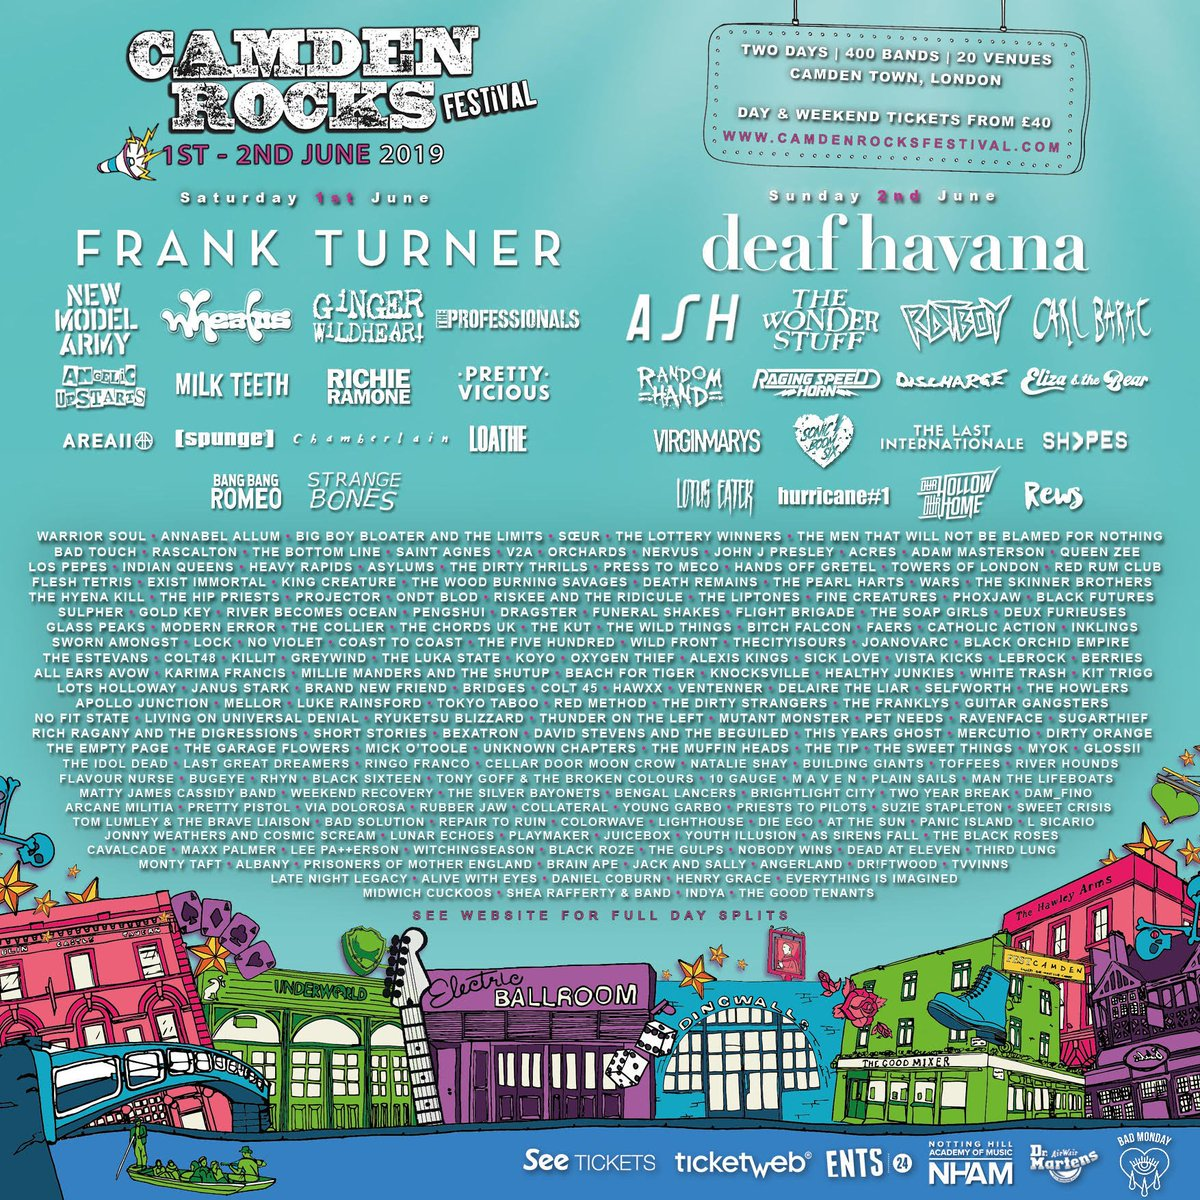 bea025ff0720c See you there for some Summer festival antics!  CamdenRocks   CamdenRocks2019  London  Livemusic  Festival  Seasonalpic.twitter .com lpFzAGe7db